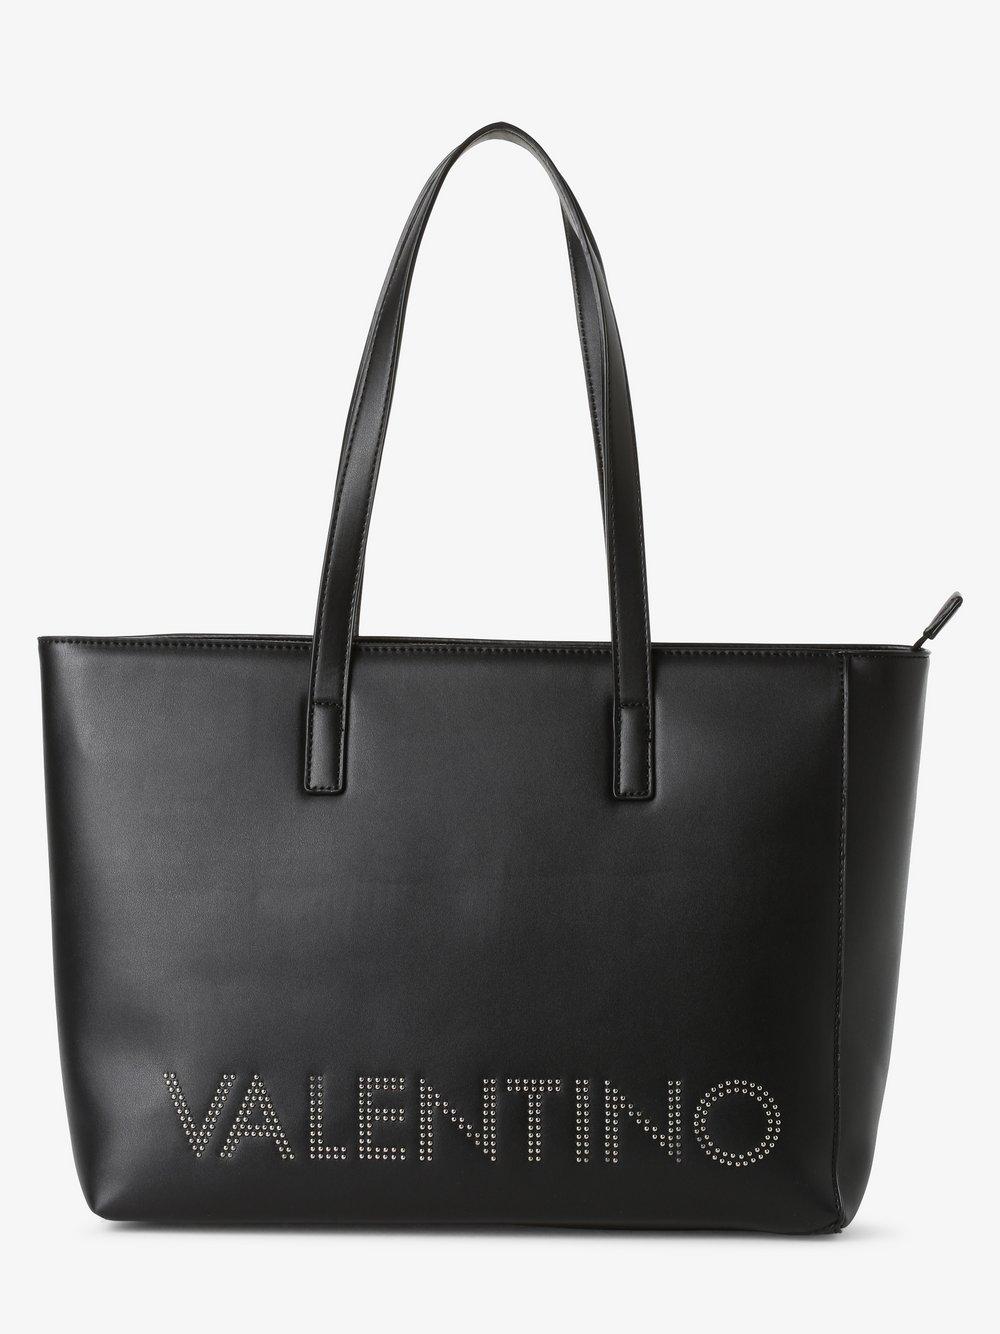 VALENTINO HANDBAGS - Damska torba shopper – Portia, czarny